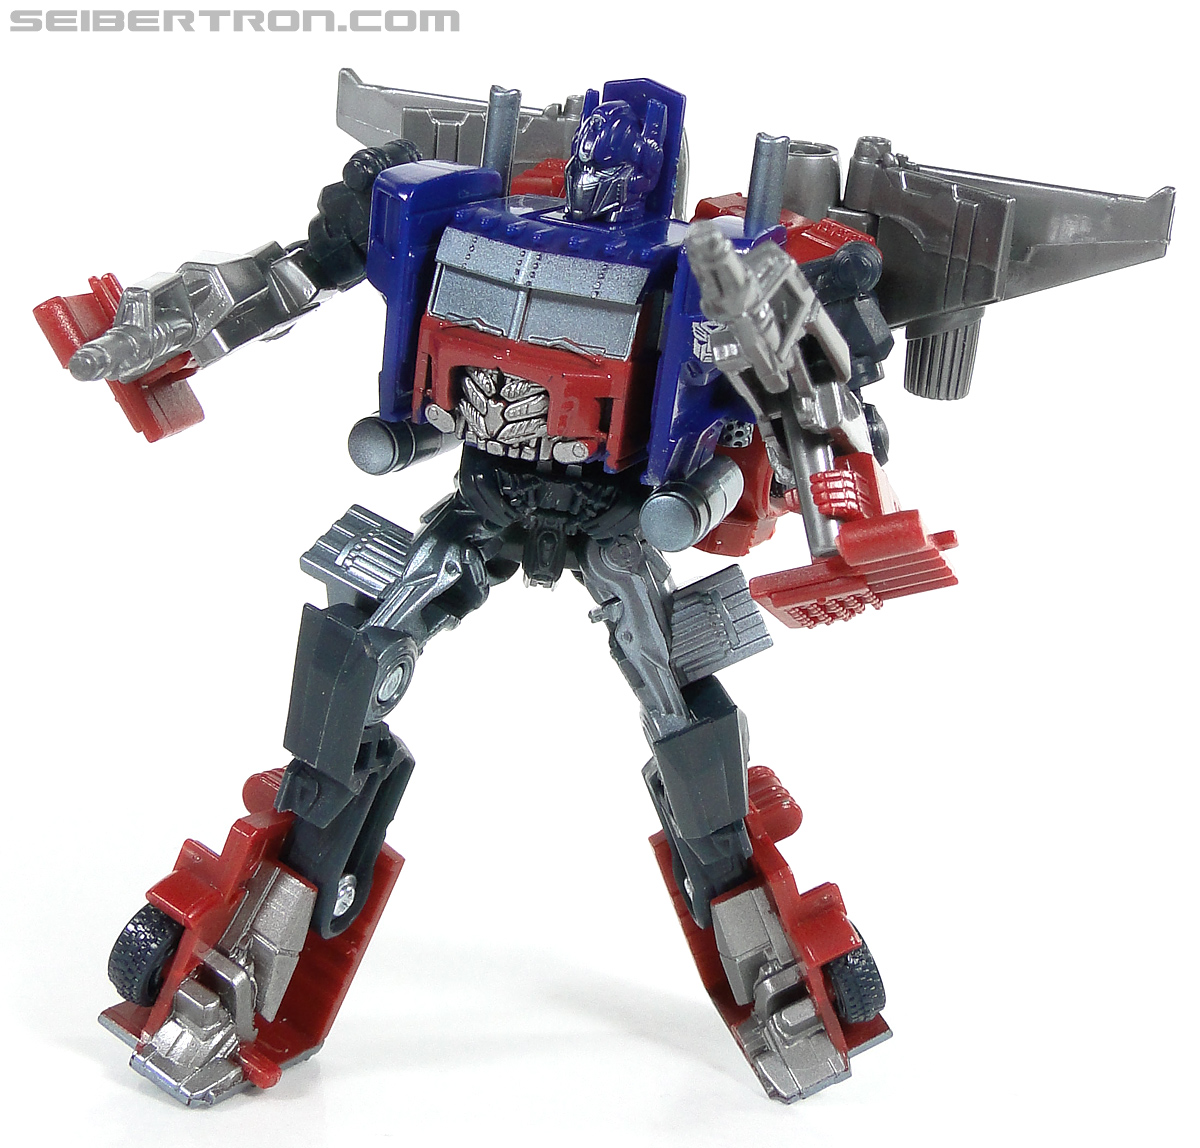 Transformers Dark of the Moon Optimus Prime (Image #159 of 235)